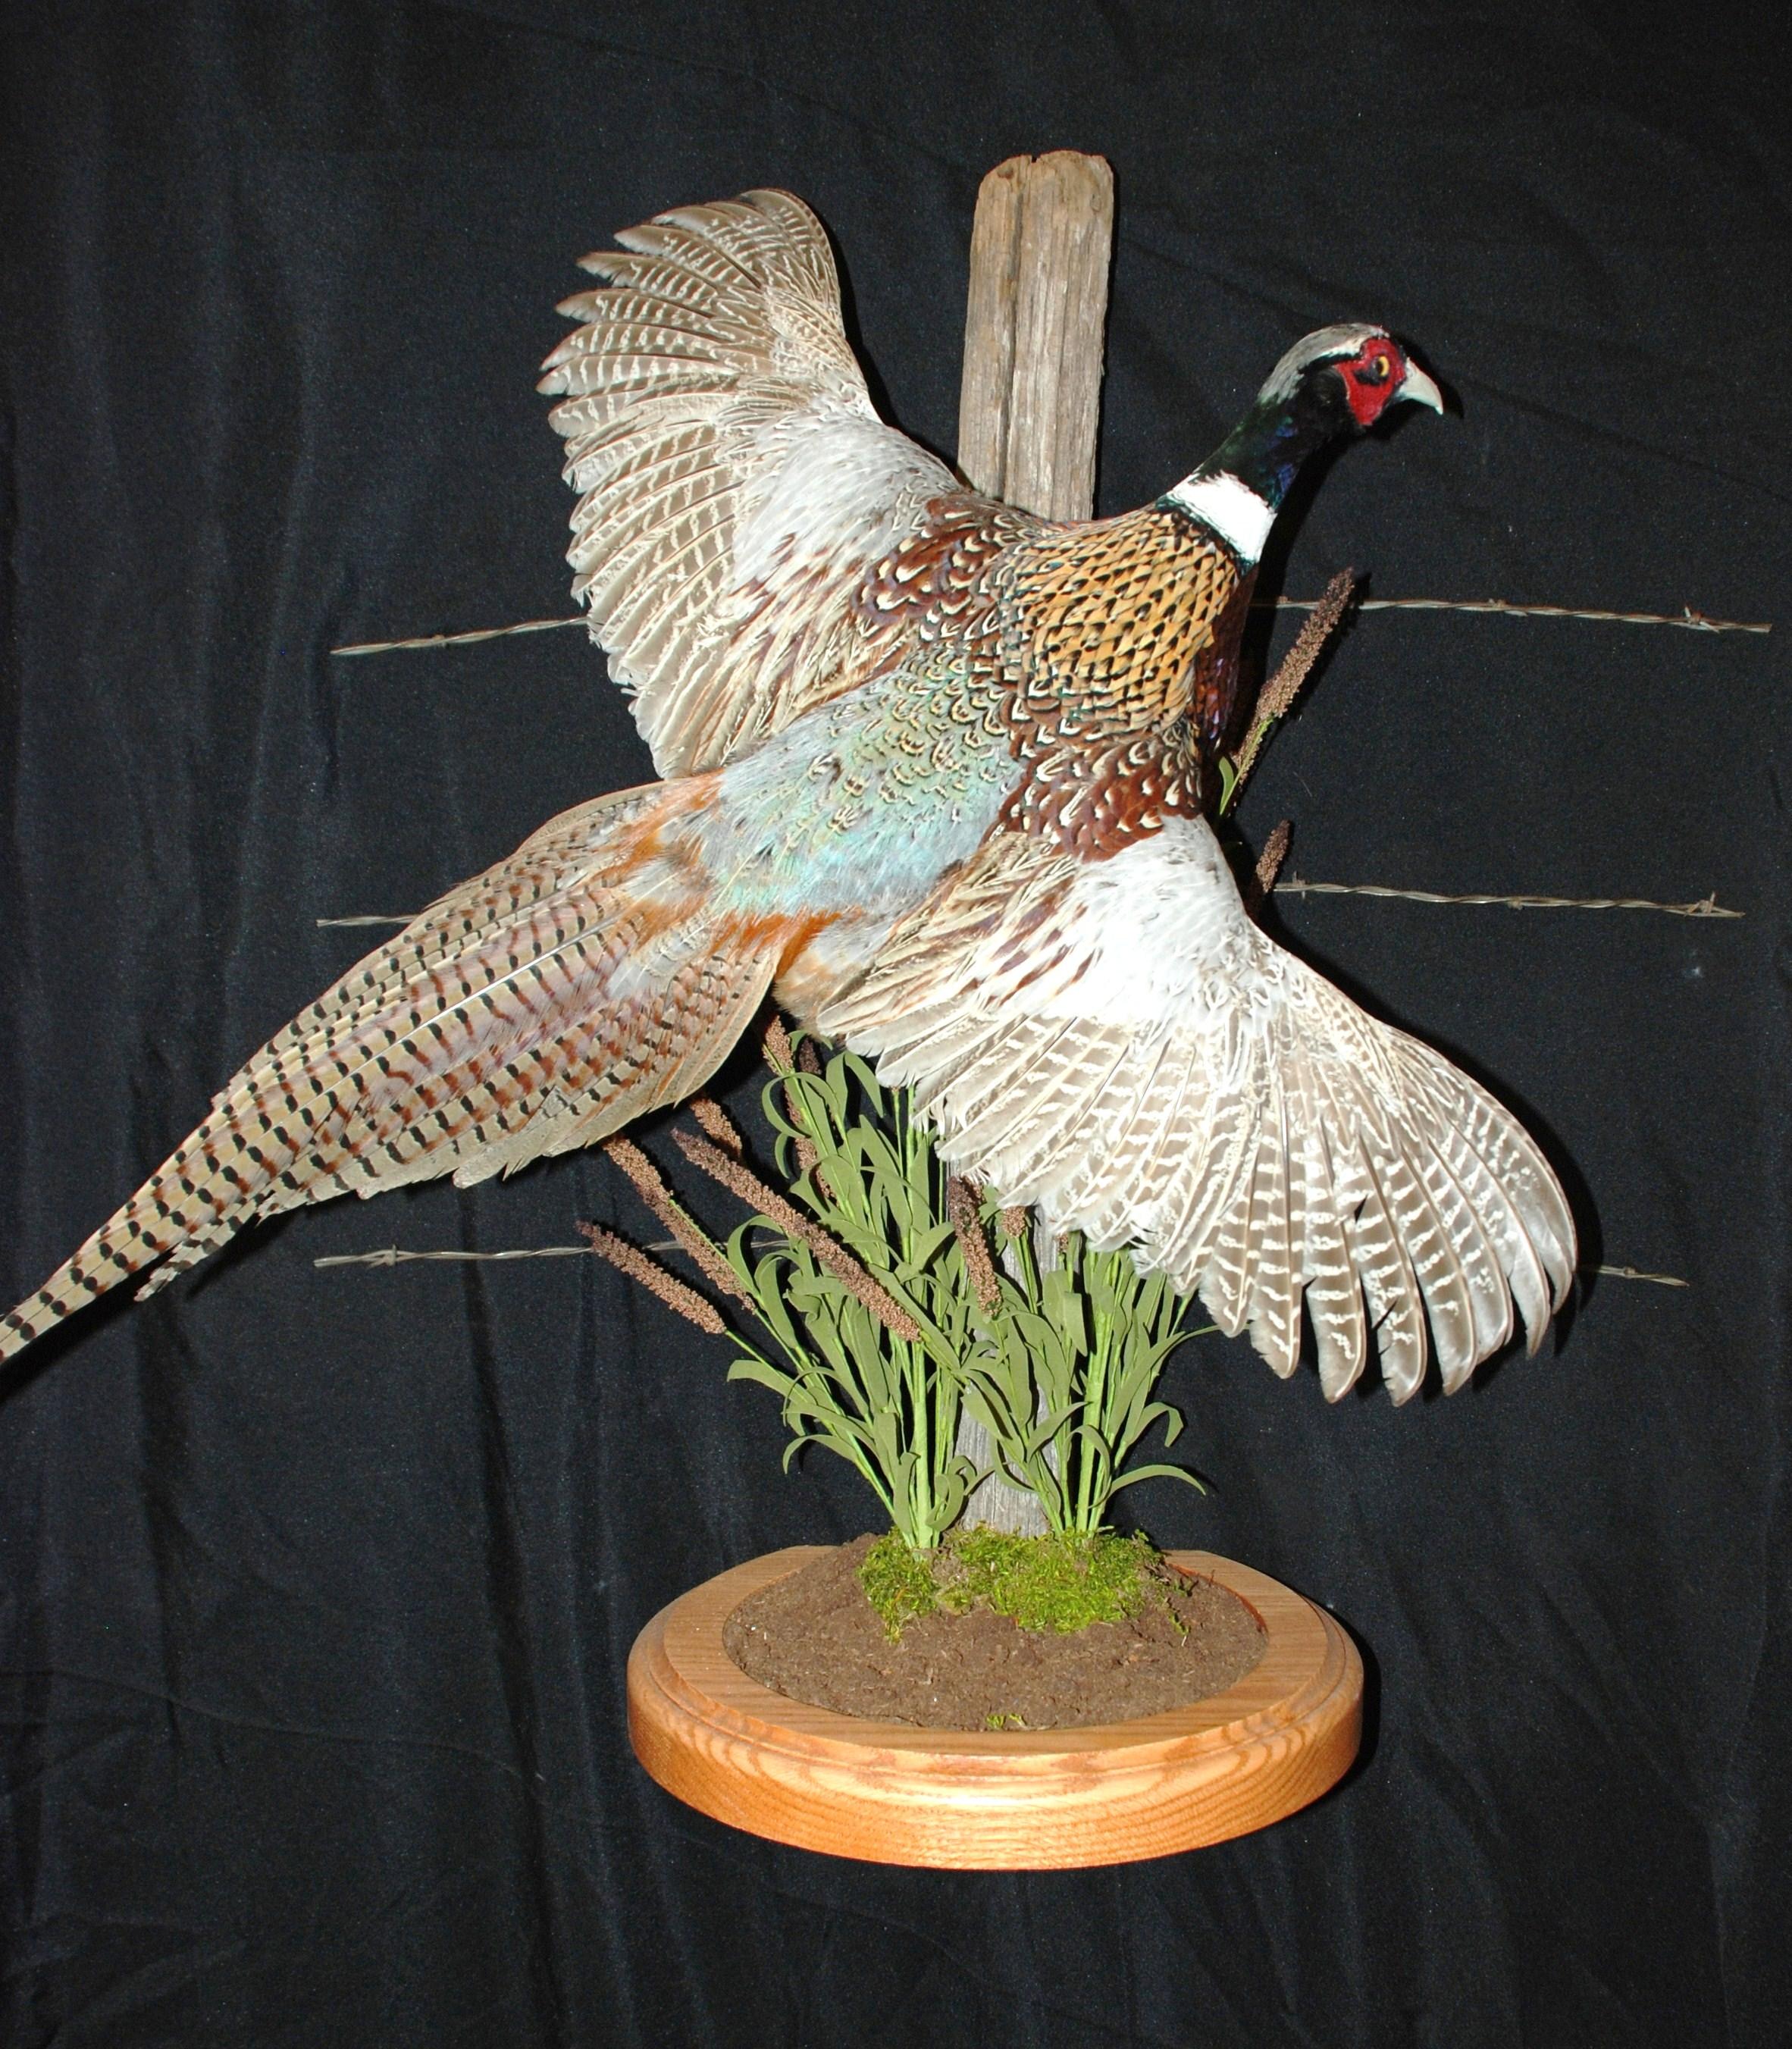 Wildlife Creations Taxidermy image 2